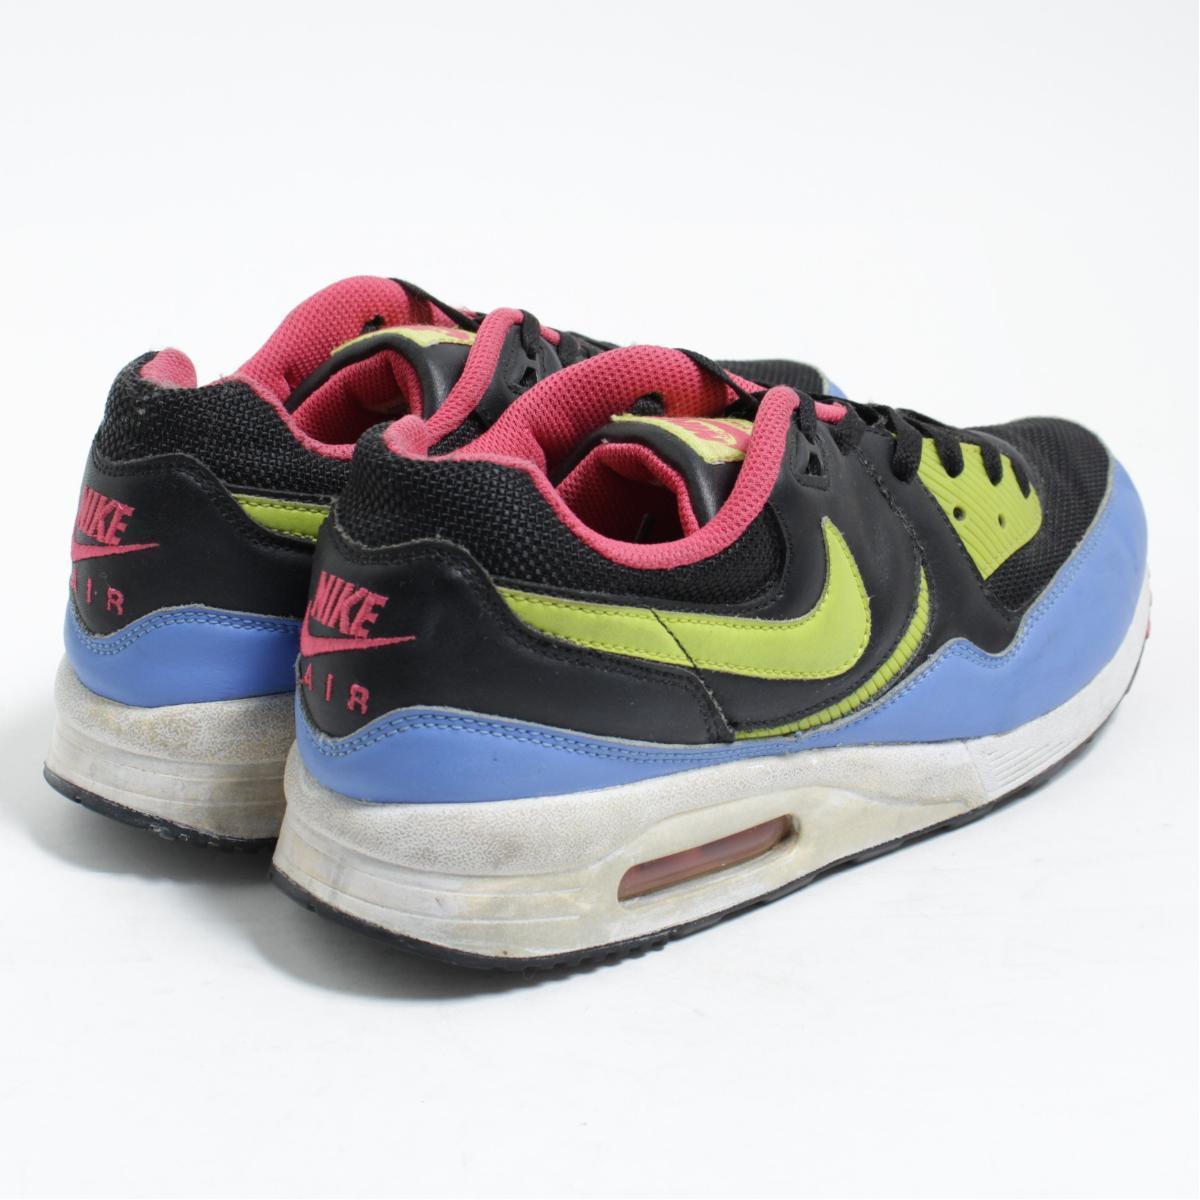 Fabolous Nike Air Mowabb Black Friday | Pacific Climate